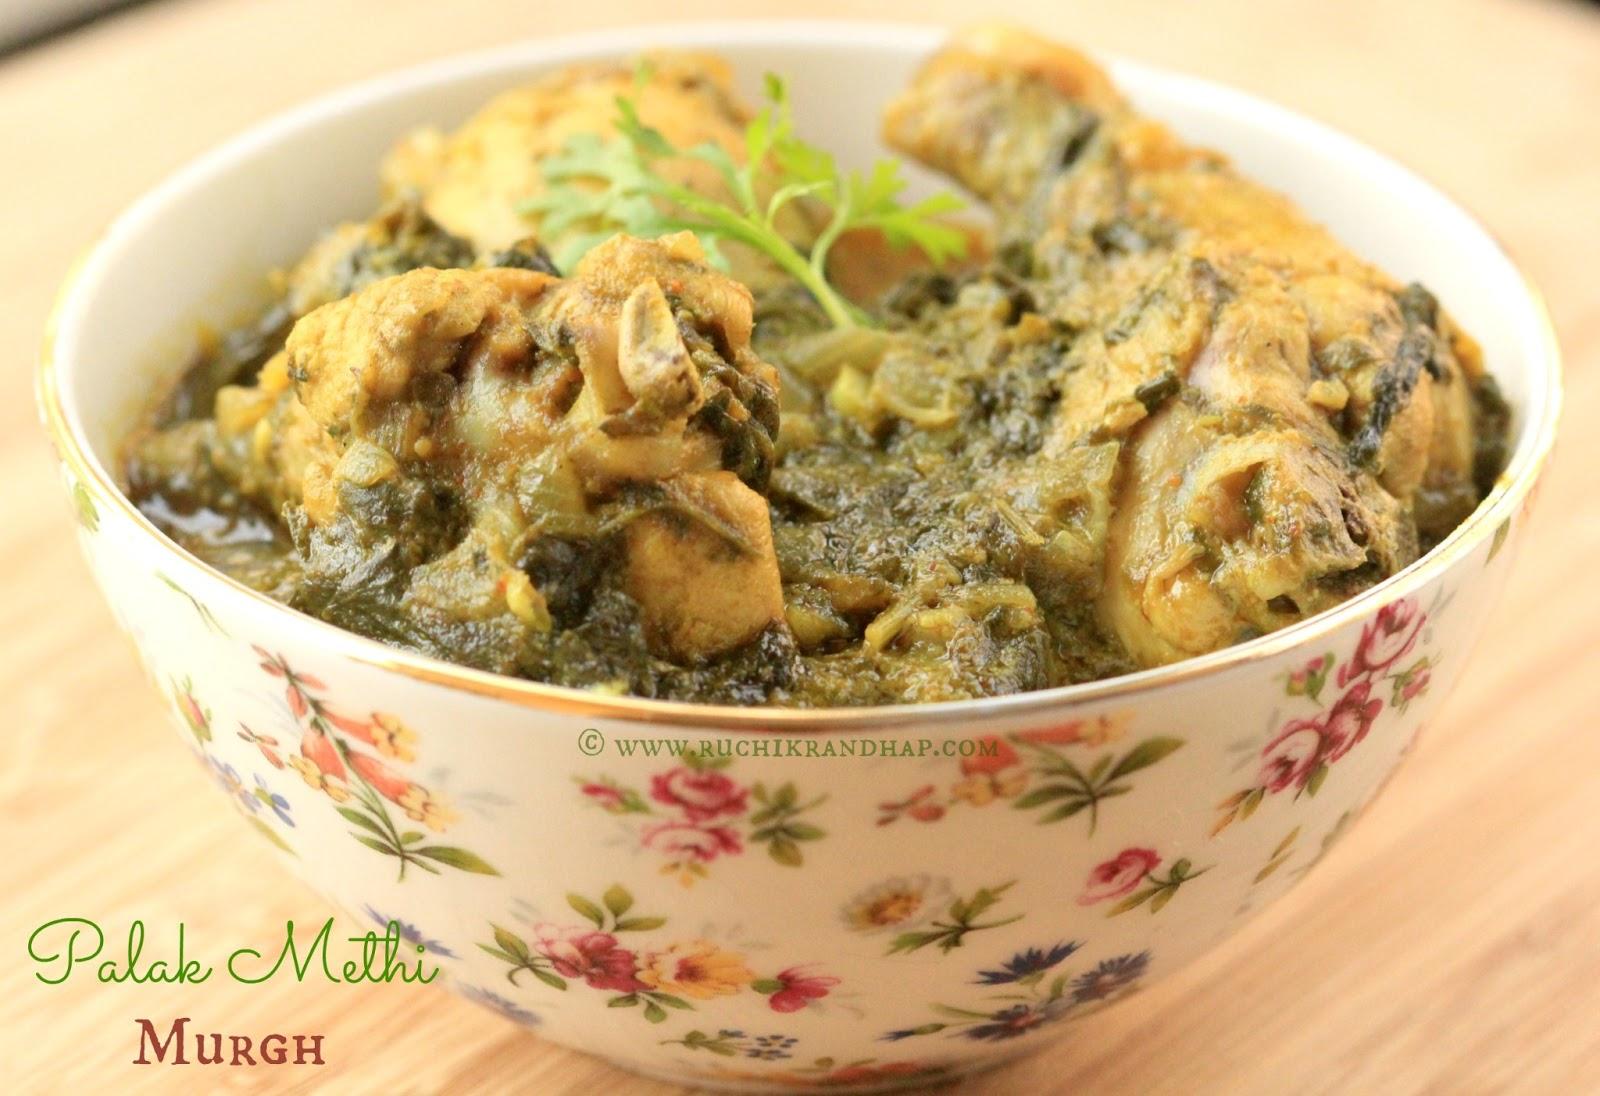 ... Methi Murgh (Spinach & Fenugreek Chicken) ~ Simple, Nutritious